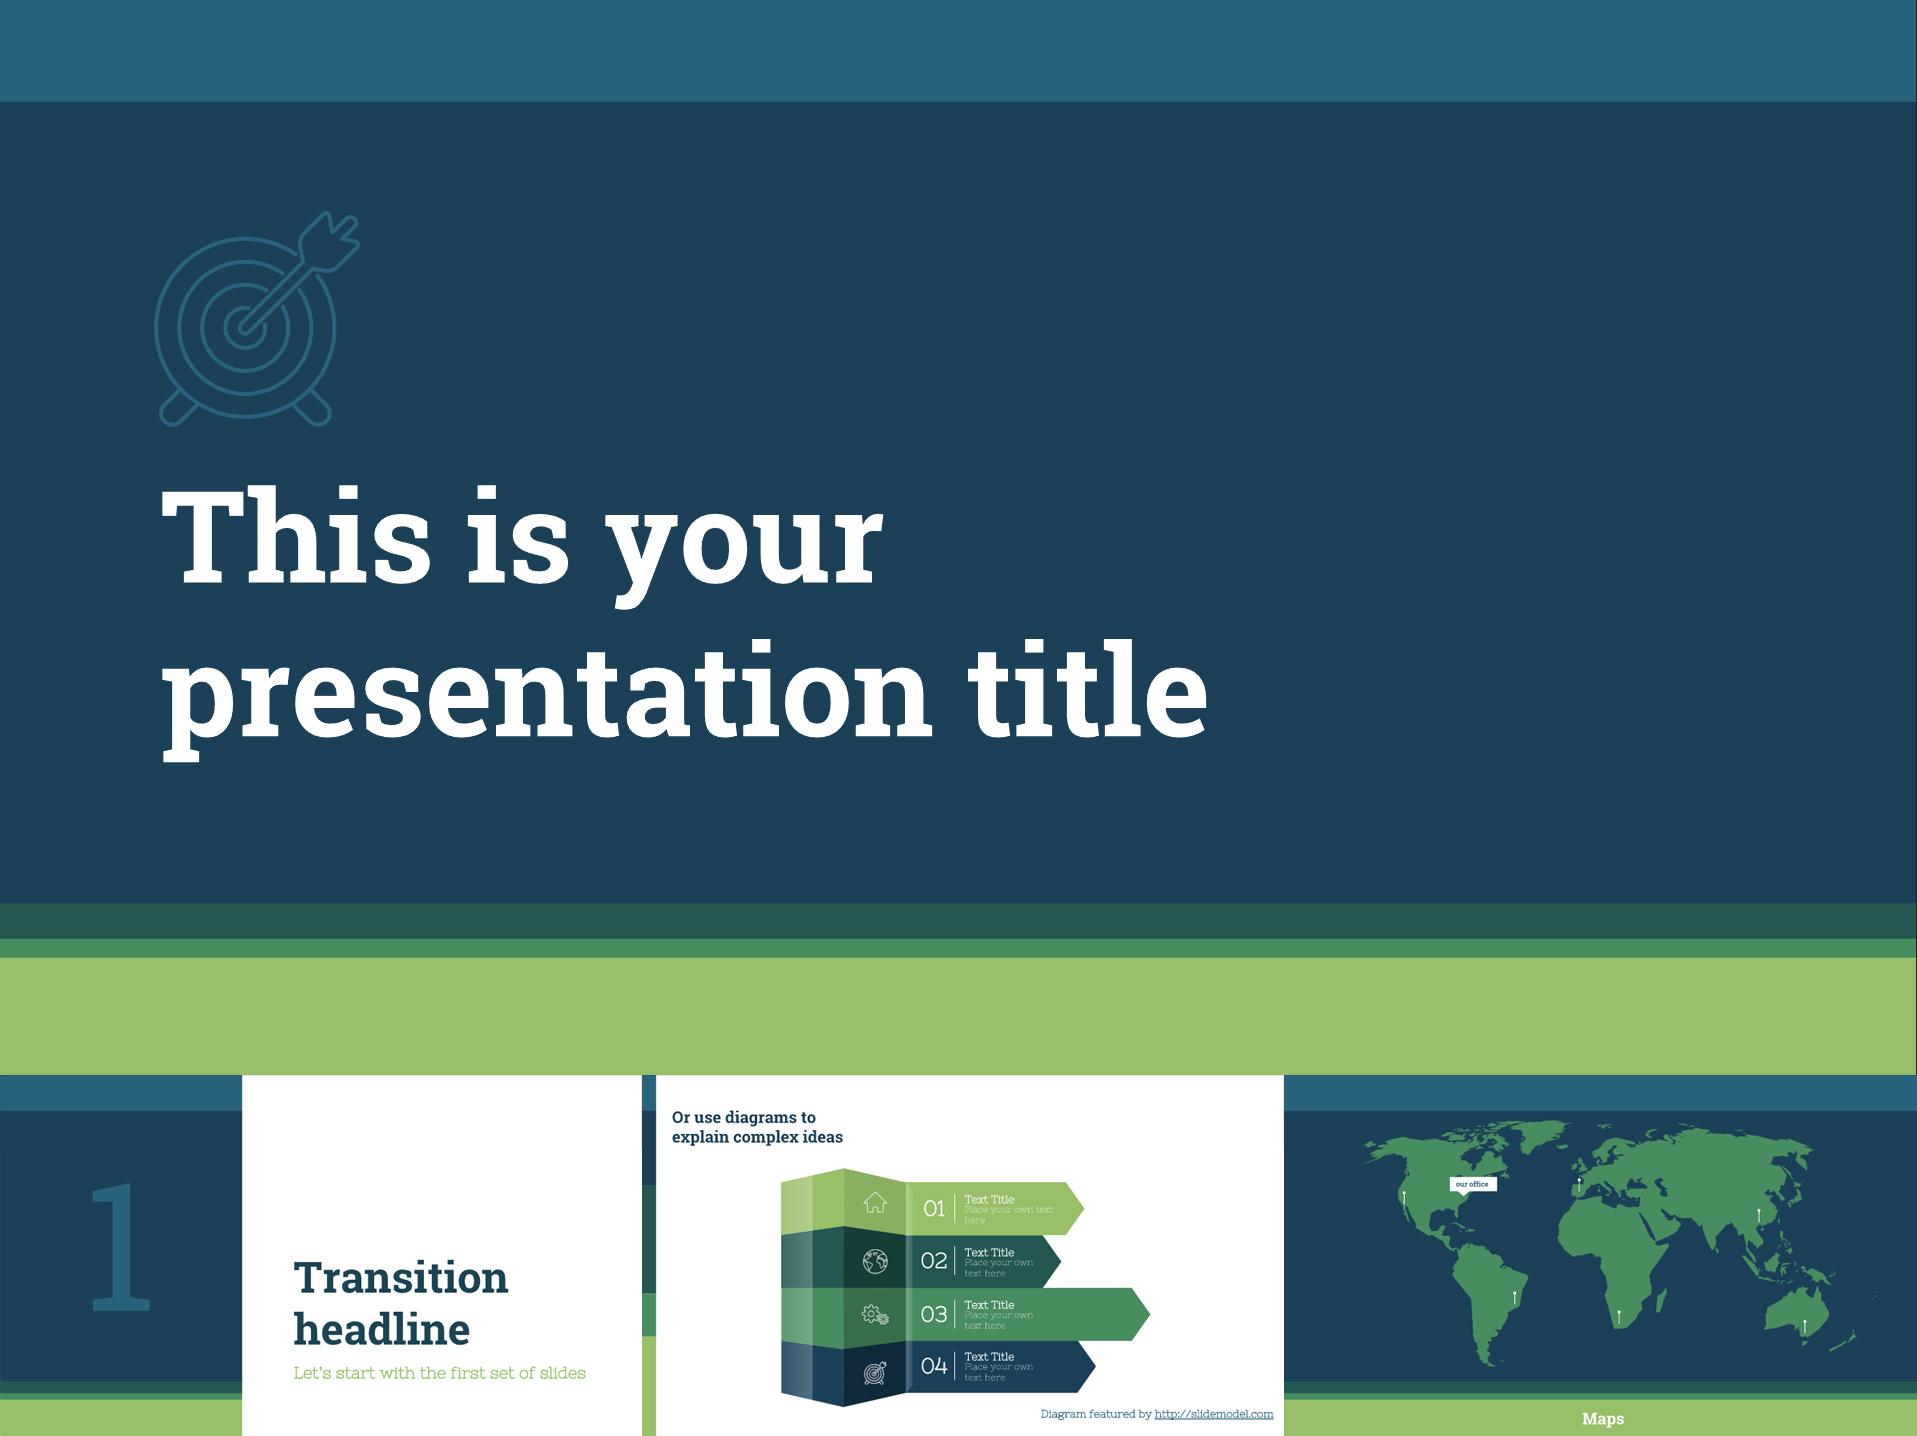 Free Business Google Slides Templates Presentation - The Internet Tips